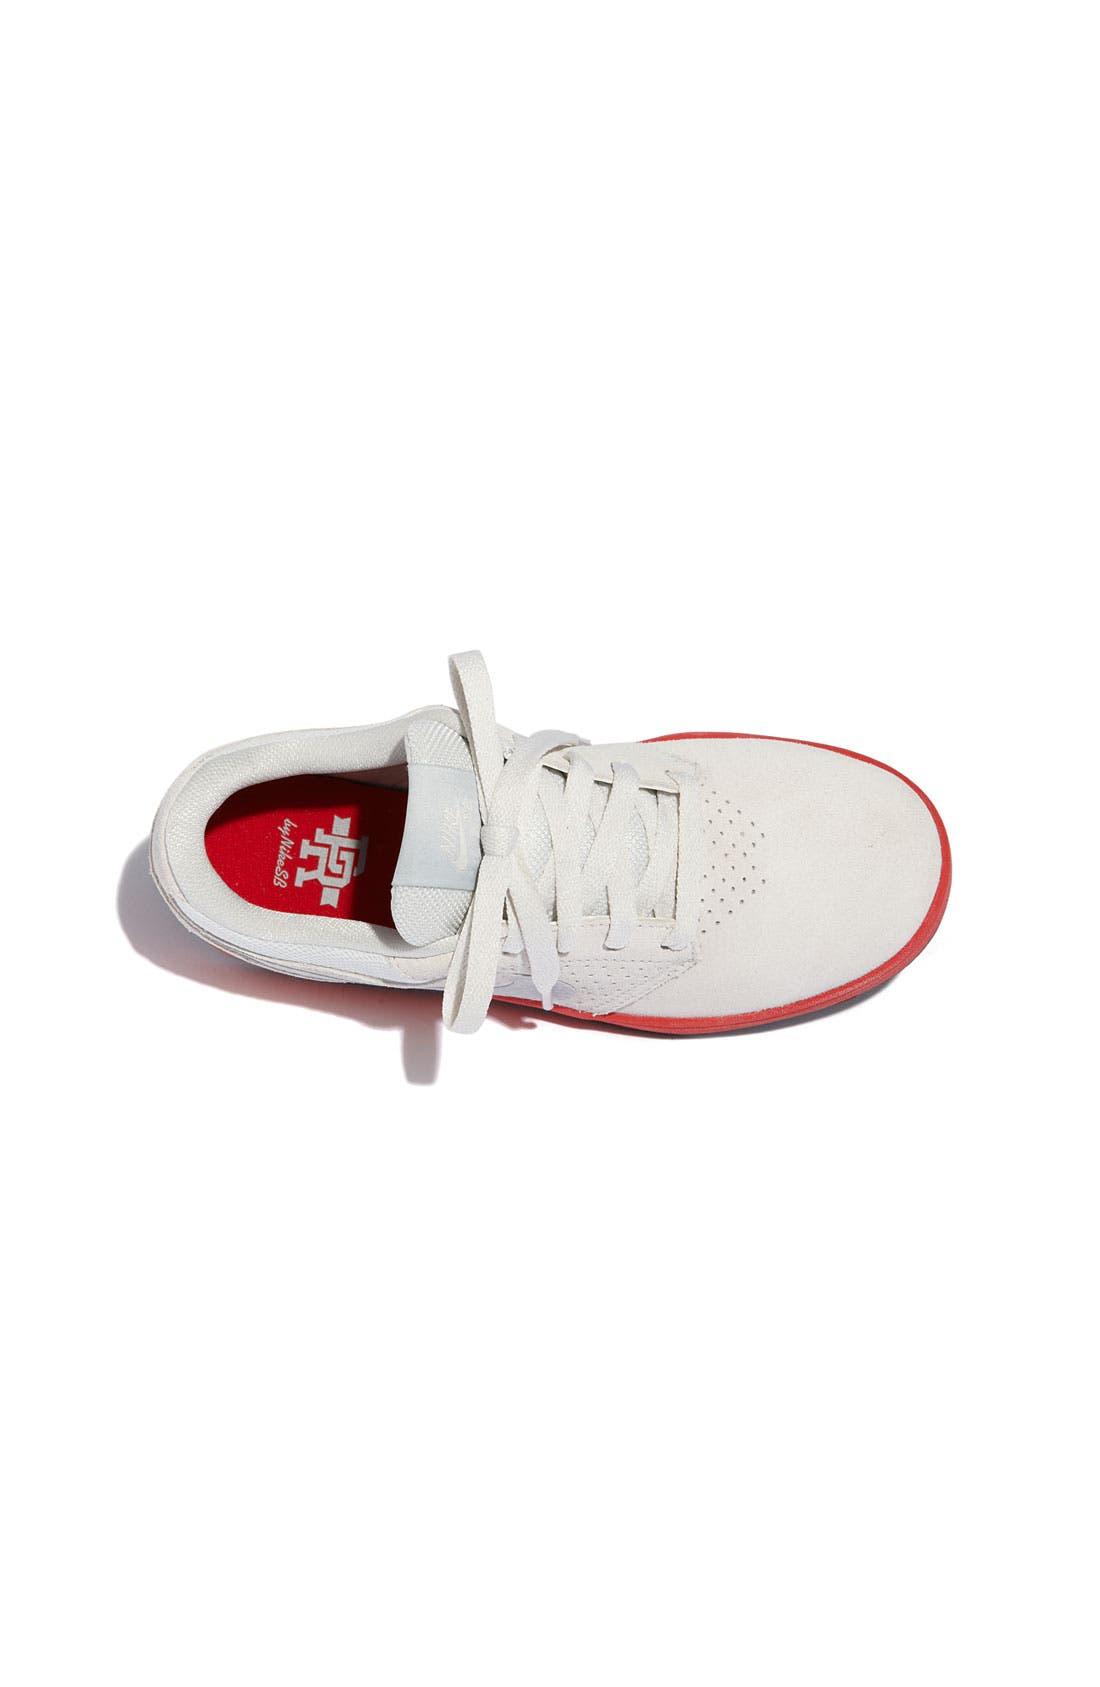 Alternate Image 3  - Nike 'Paul Rodriguez 5' Skate Shoe (Little Kid & Big Kid)